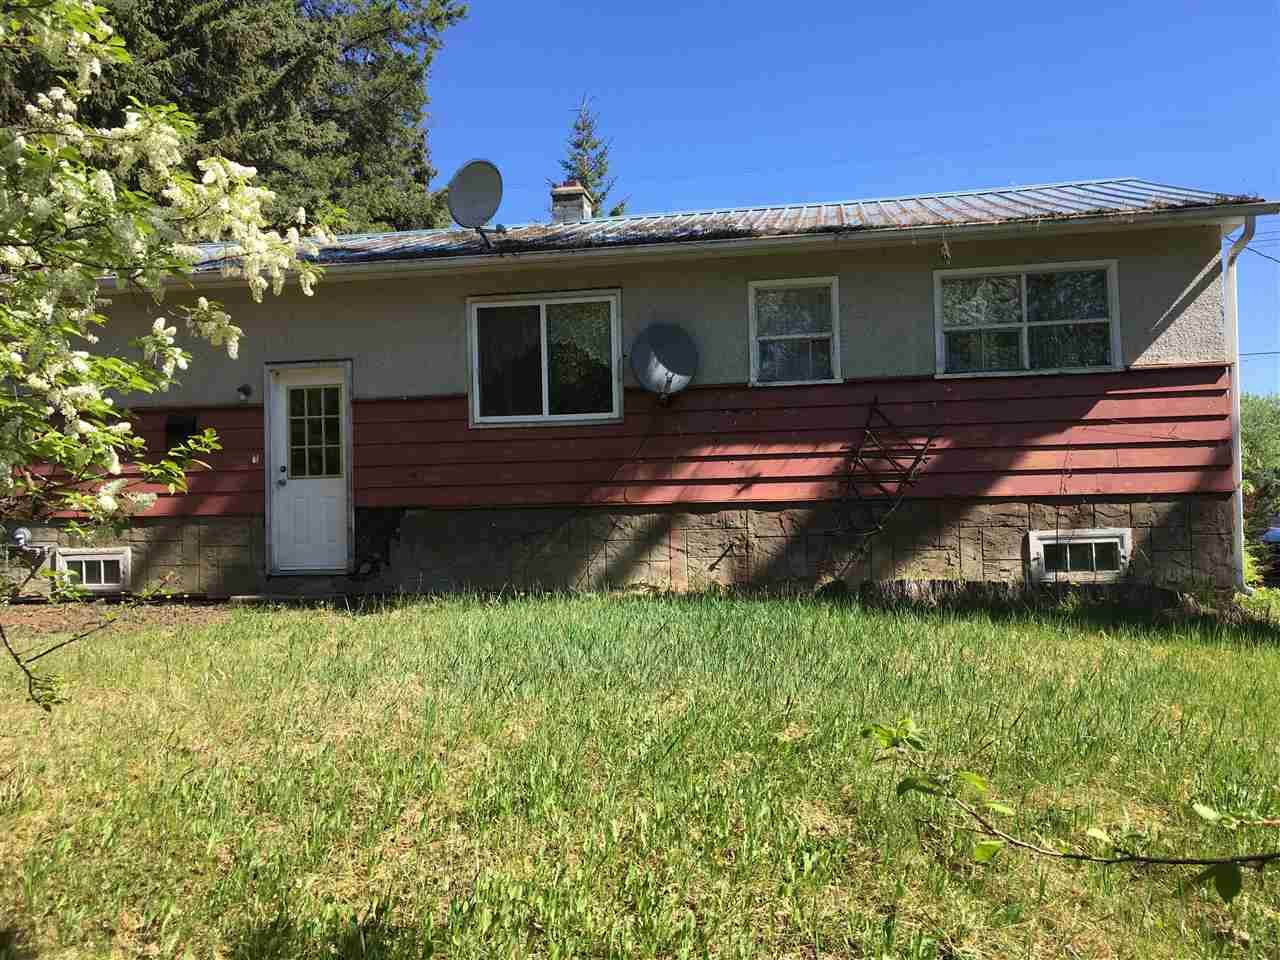 Main Photo: 5419 50 Avenue: Fawcett House for sale : MLS®# E4204470